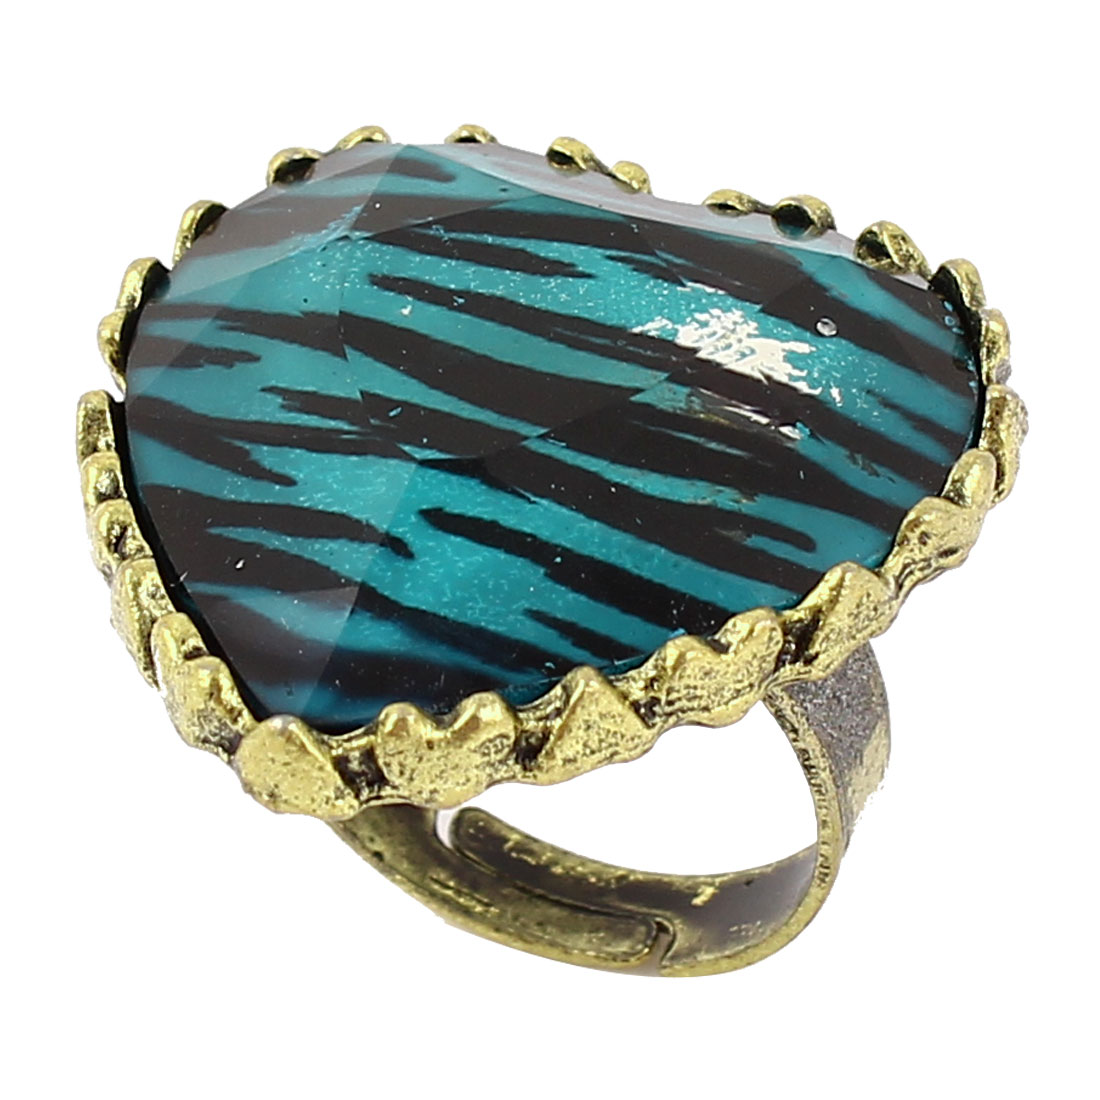 Heart Design Leopard Print Brass Tone Finger Ring US 6 1/2 for Ladies